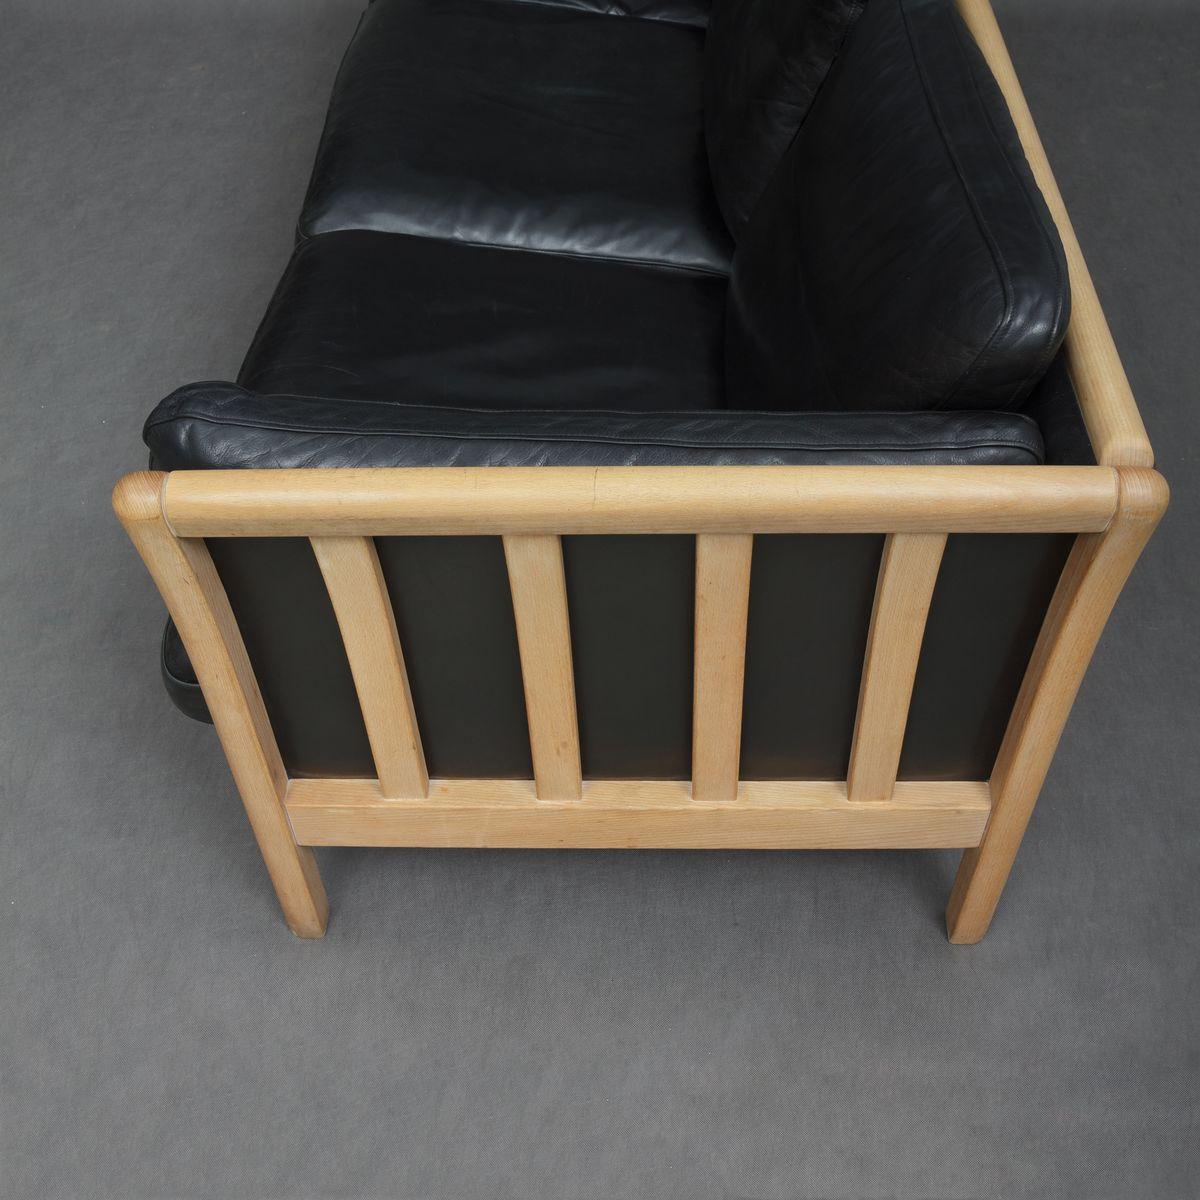 Danish Black Leather Sofa by Mogens Hansen 1980s for sale